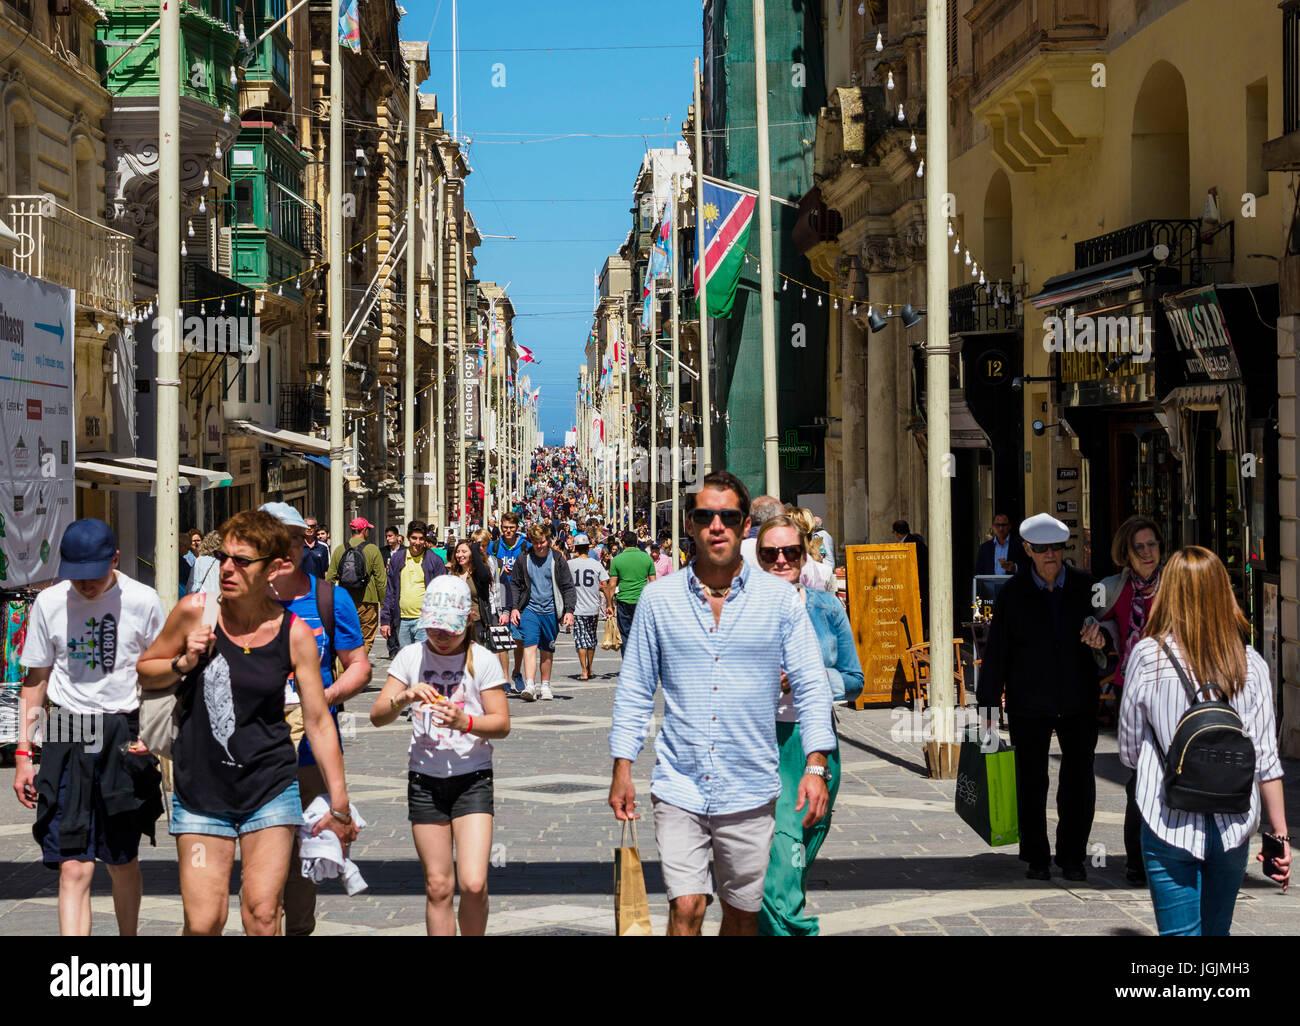 Pedestrians walk over Republic Street / Triq Ir-Repubblika at Valletta  / Malta. - Stock Image